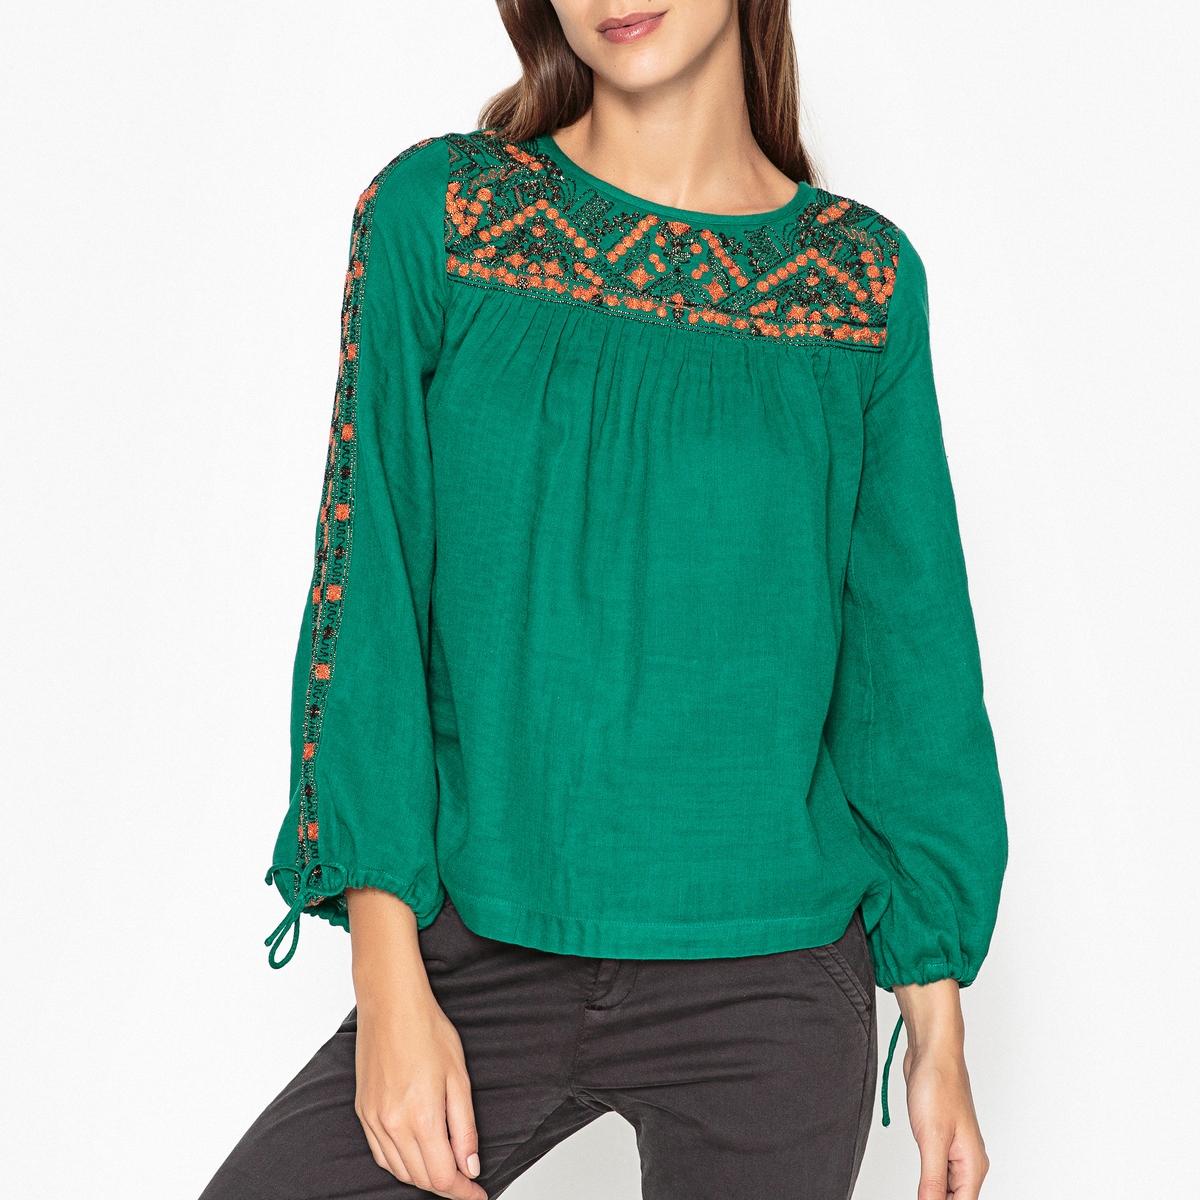 Блузка с вышивкой ANAIS anais gillian комбинация